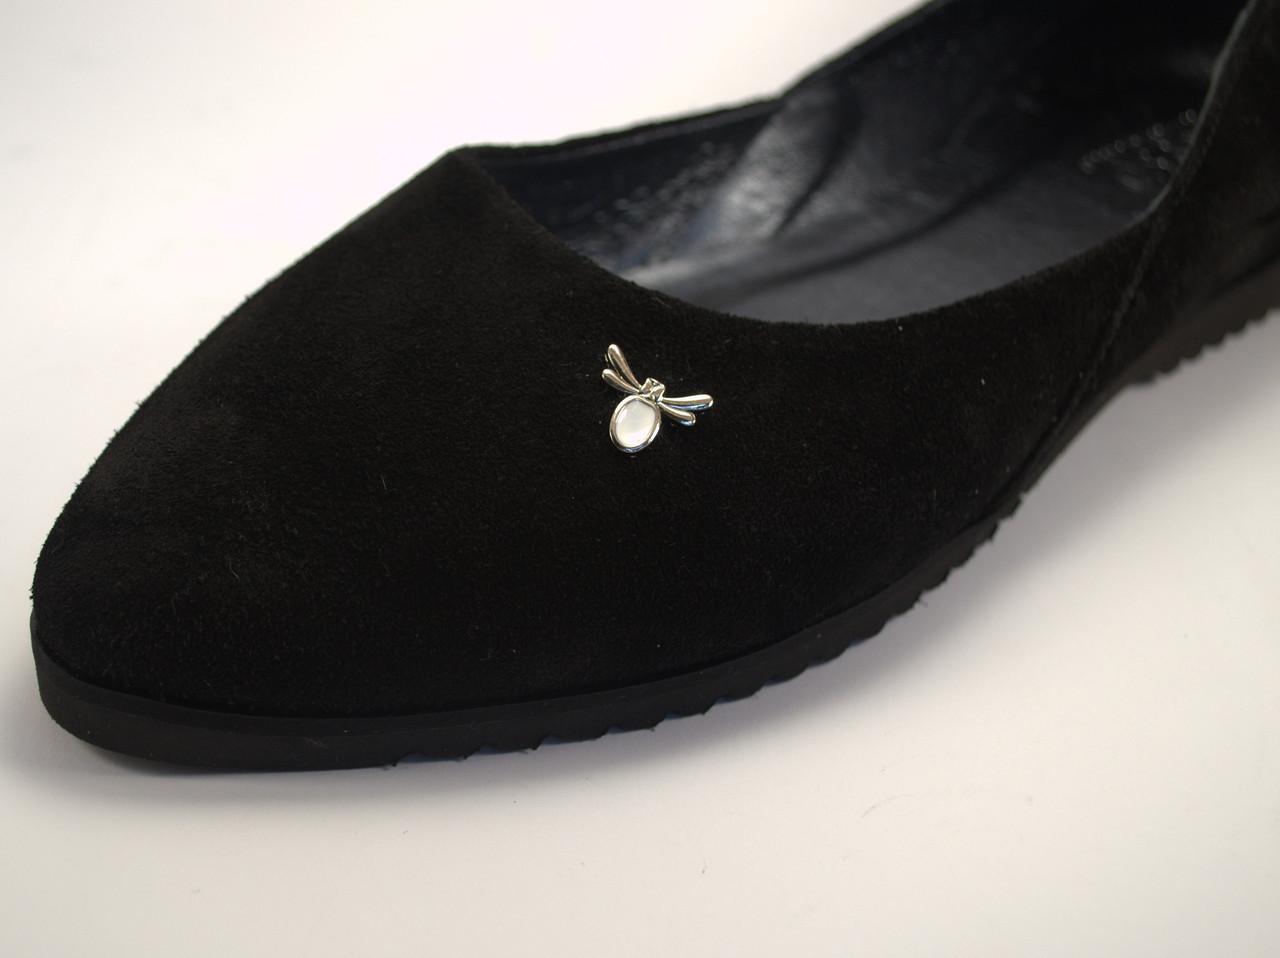 Балетки женские большого размера замшевые Scarab V Gold White Vel by Rosso Avangard BS цвет черный